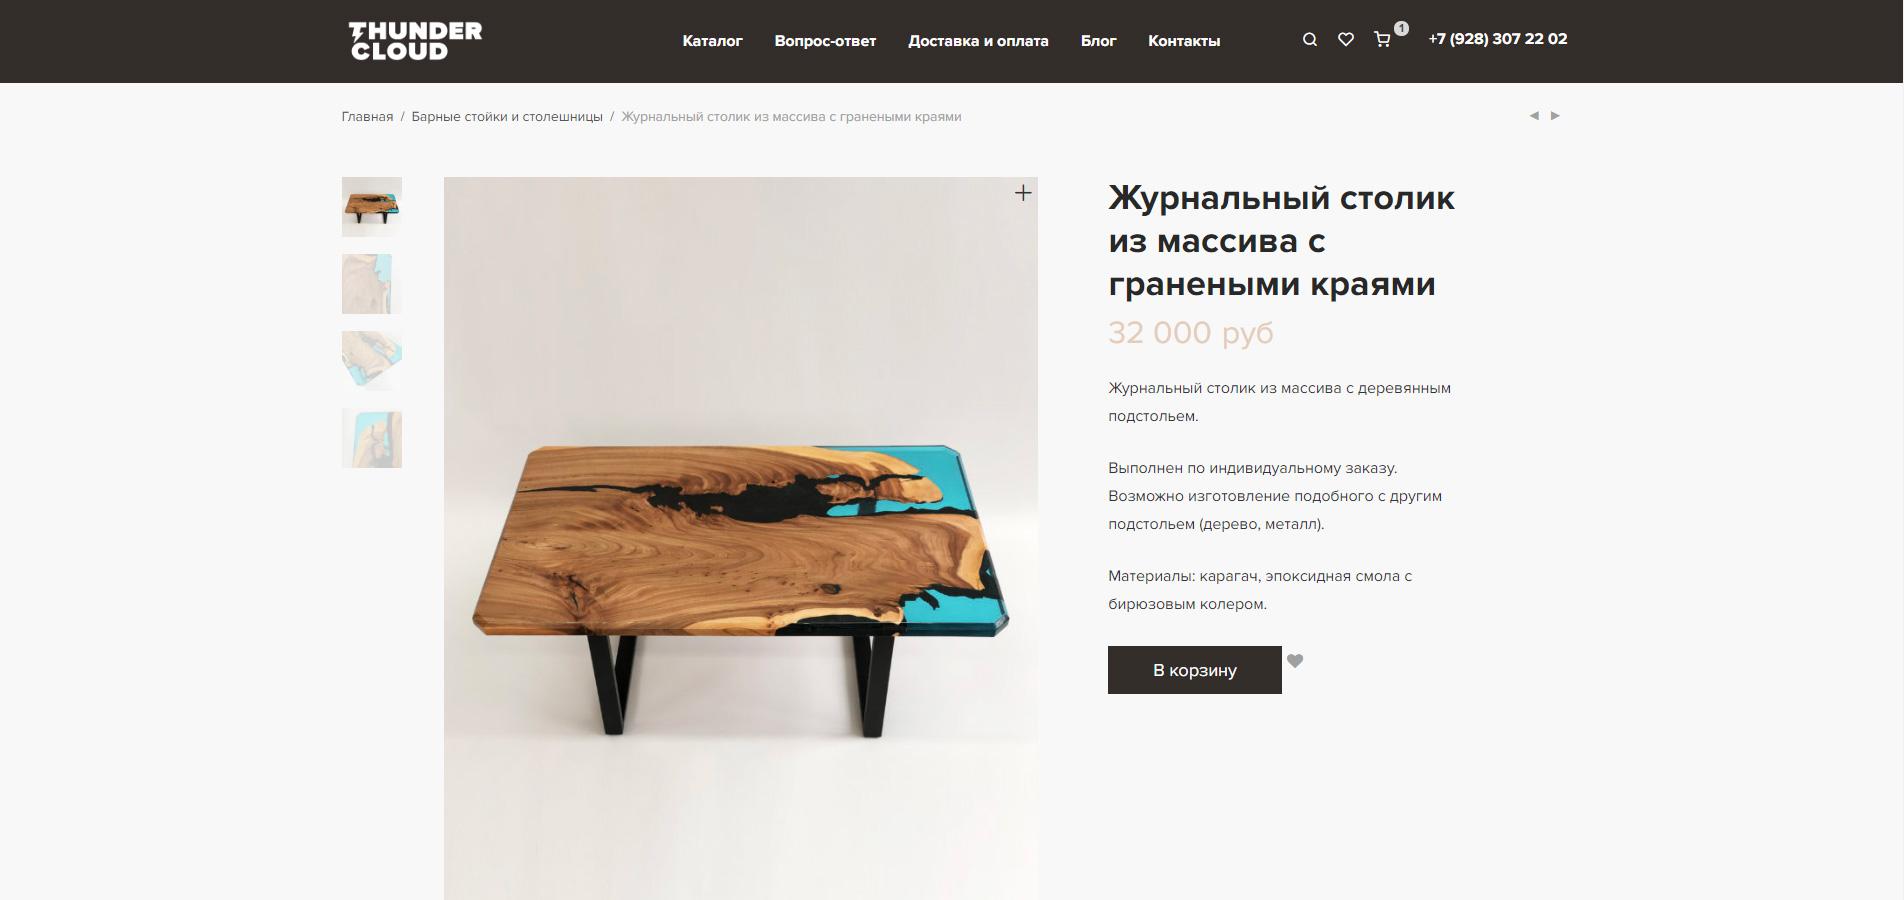 Thundercloud_design